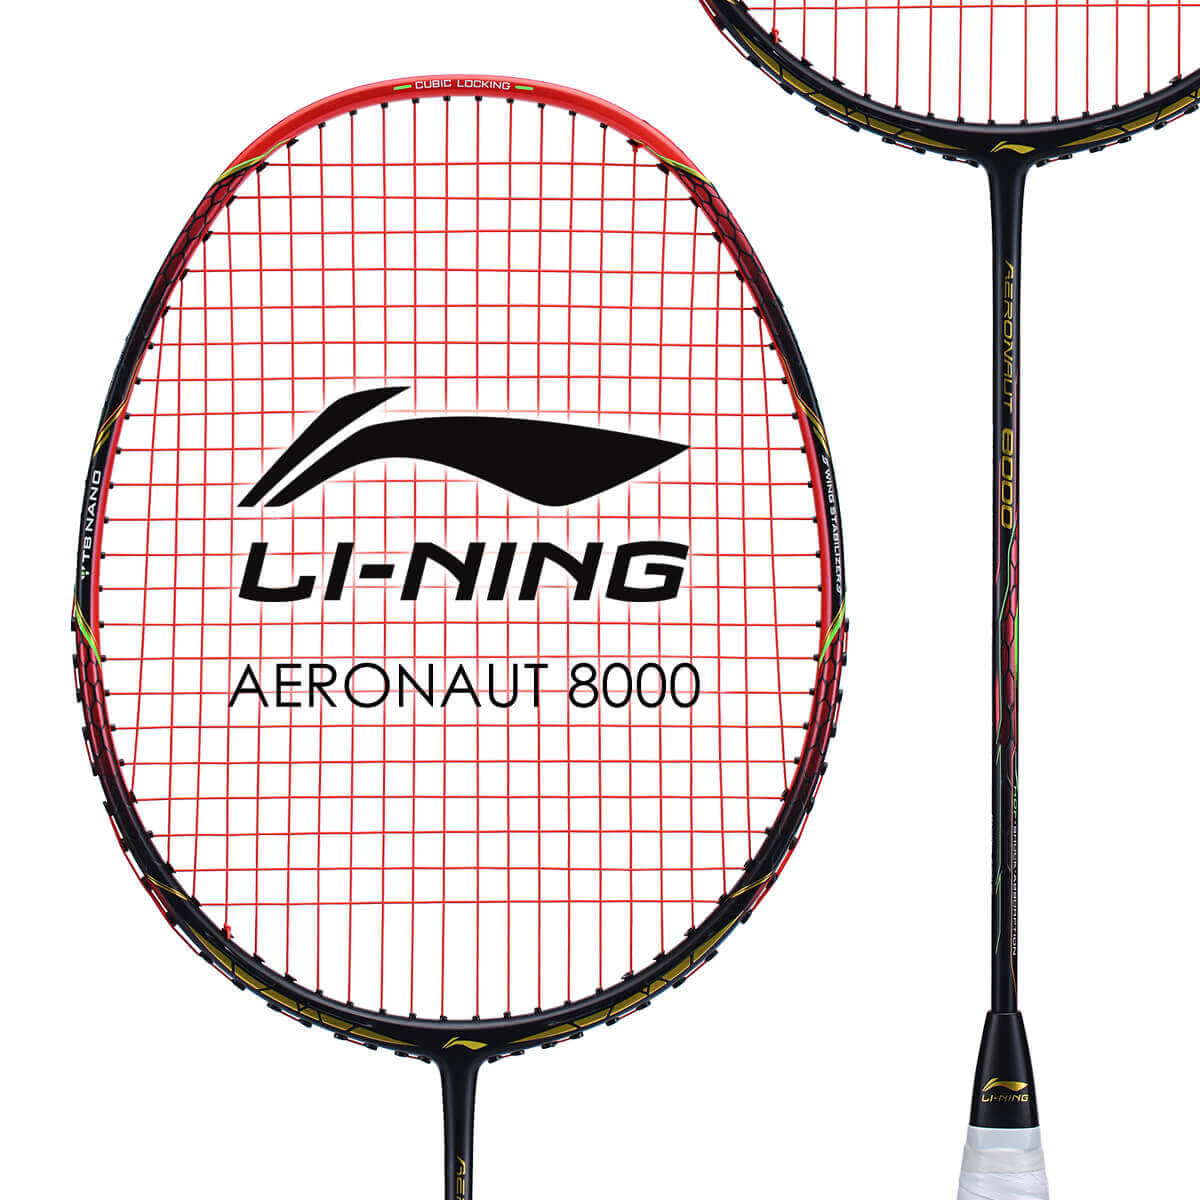 LI-NING AERONAUT 8000(AN8000) 風洞設計 AYPN218-1 バドミントンラケット リーニン【日本バドミントン協会審査合格品/オススメガット&ガット張り工賃無料】